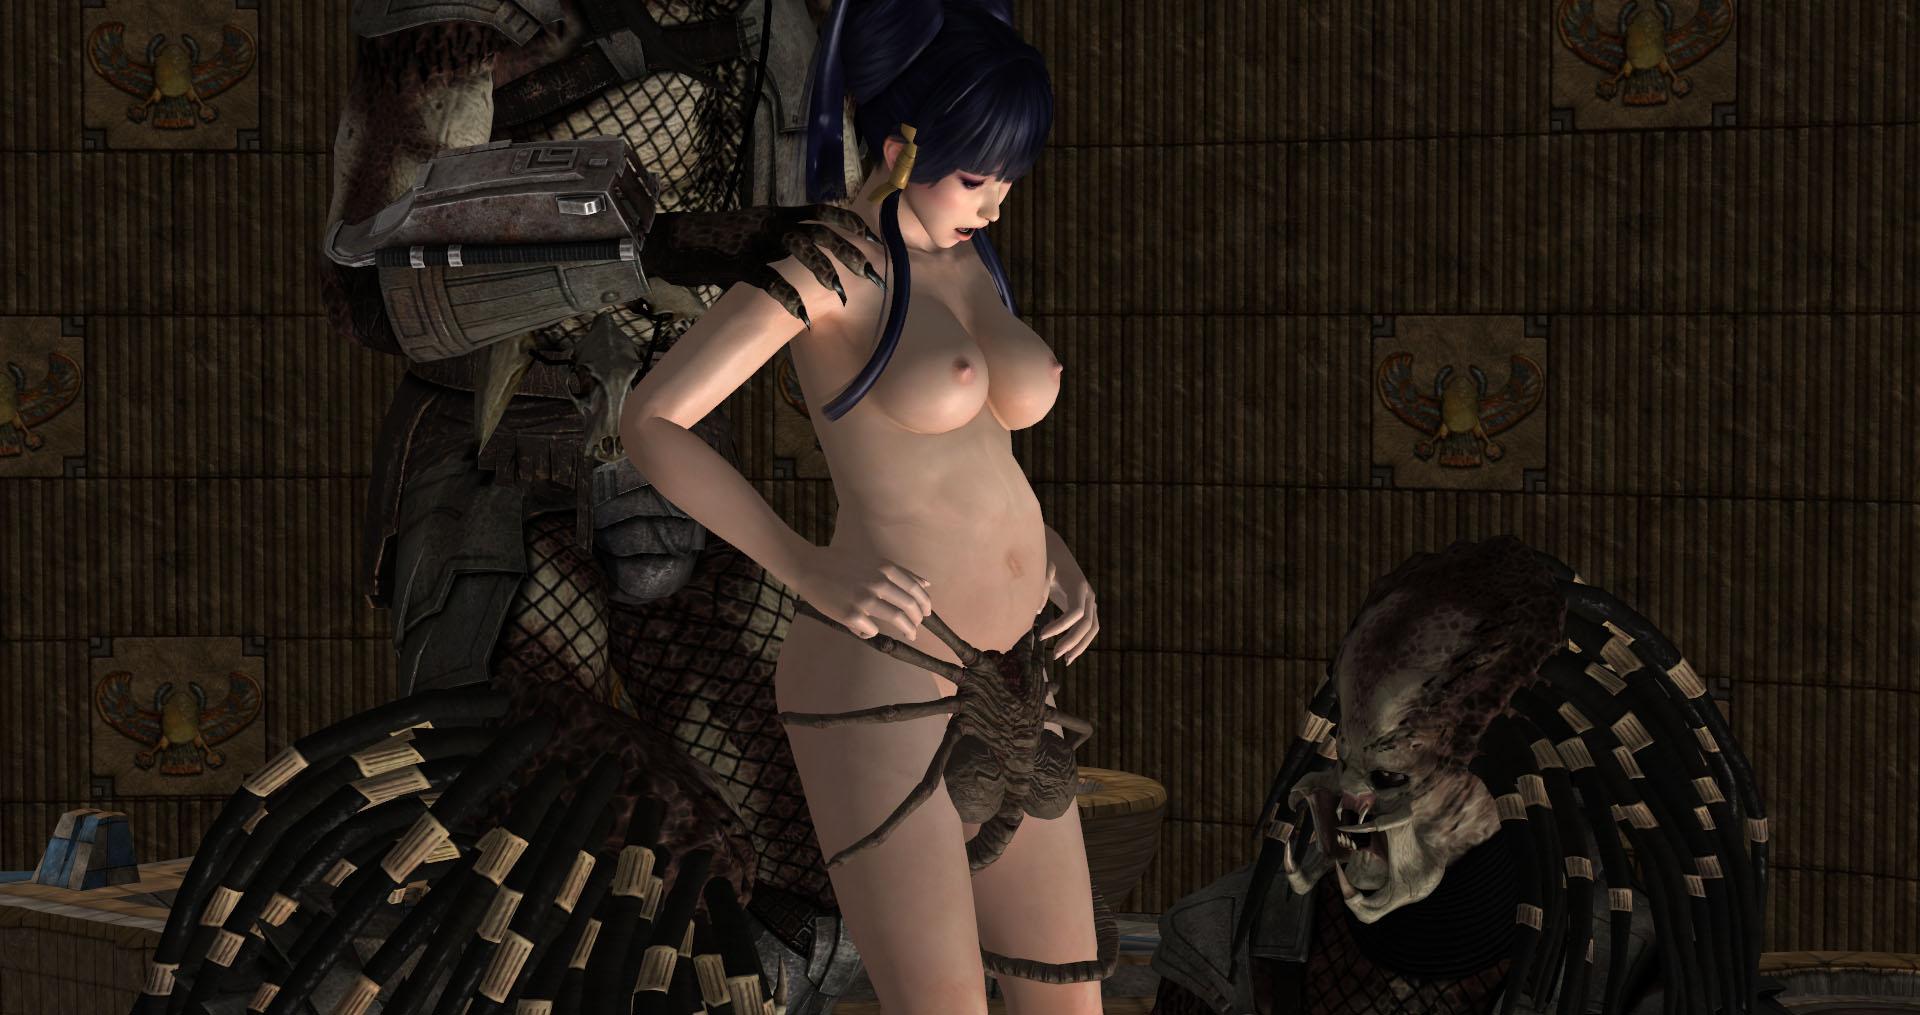 nyotengu_sacrifice_to_pussy_hugger_0043_layer_43_by_bitemonsters-dbgzcm0.jpg